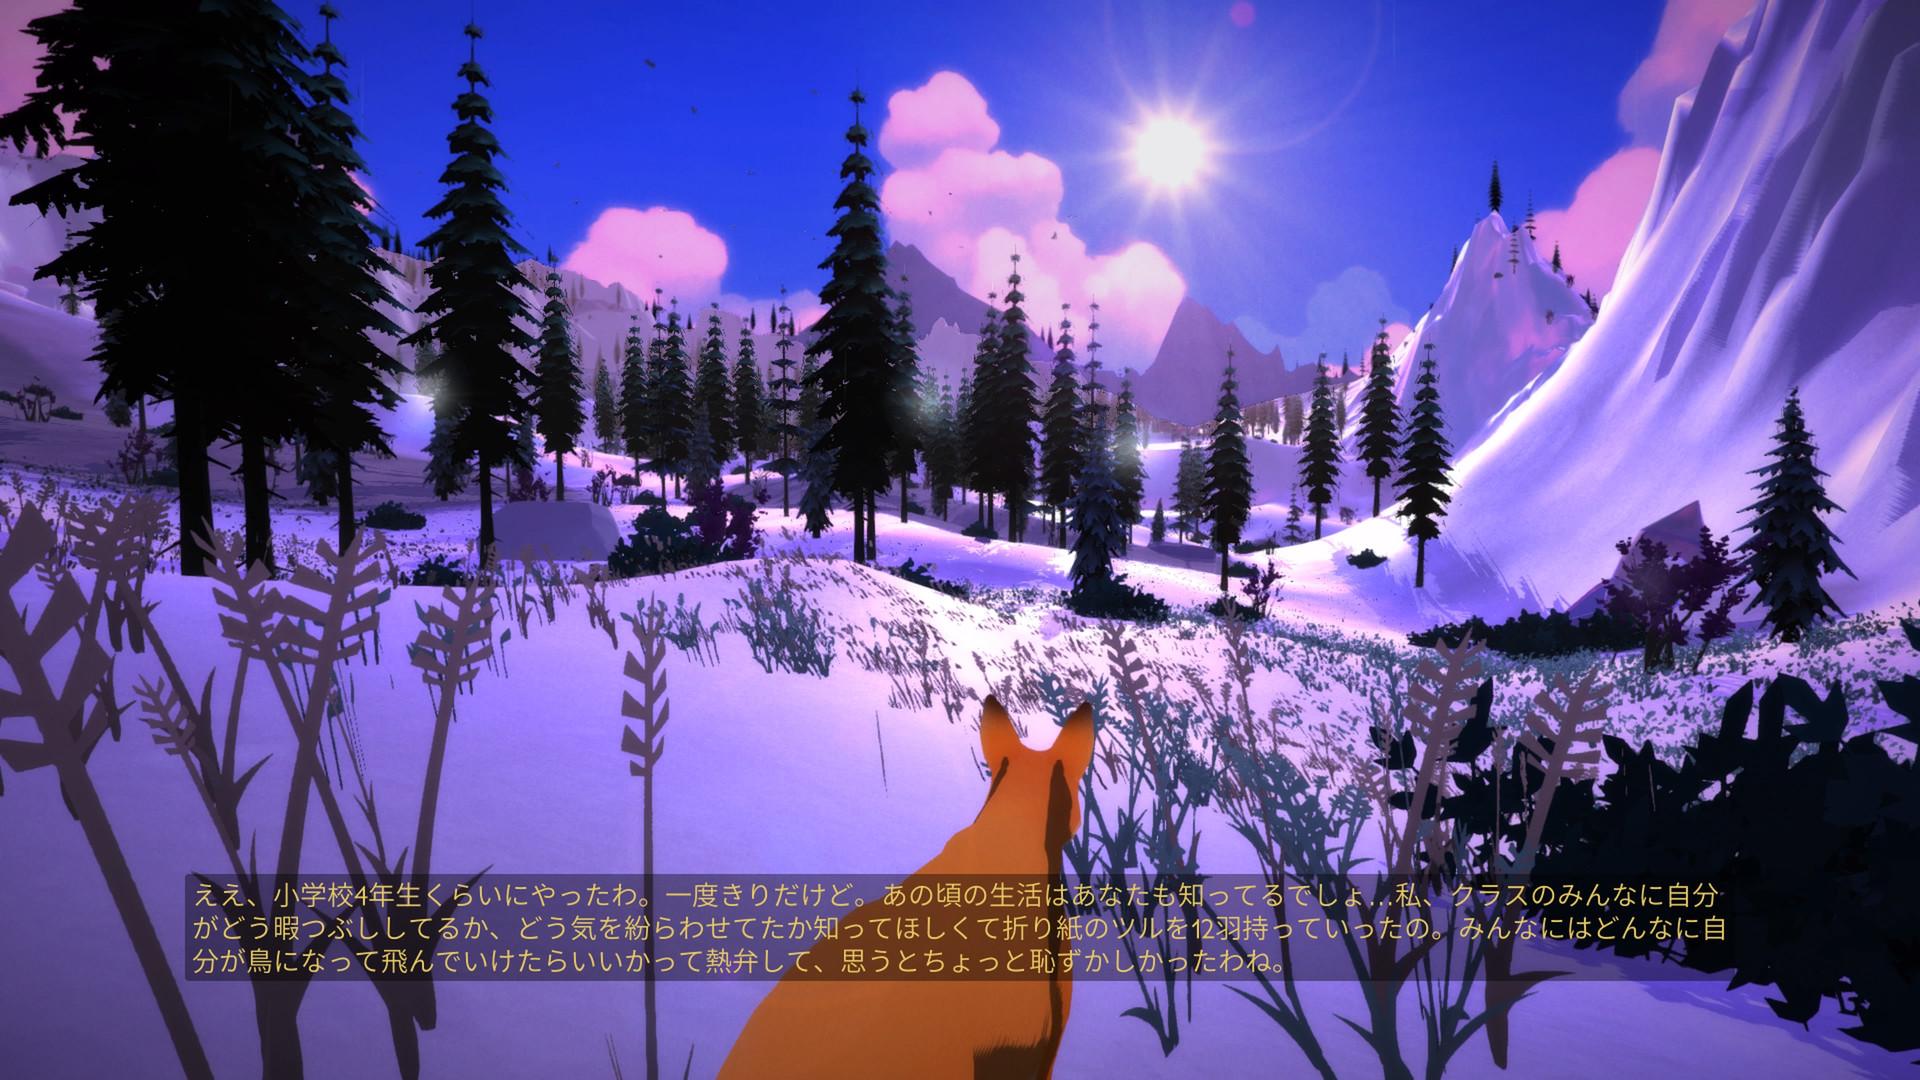 The First Tree_20200507232235.jpg